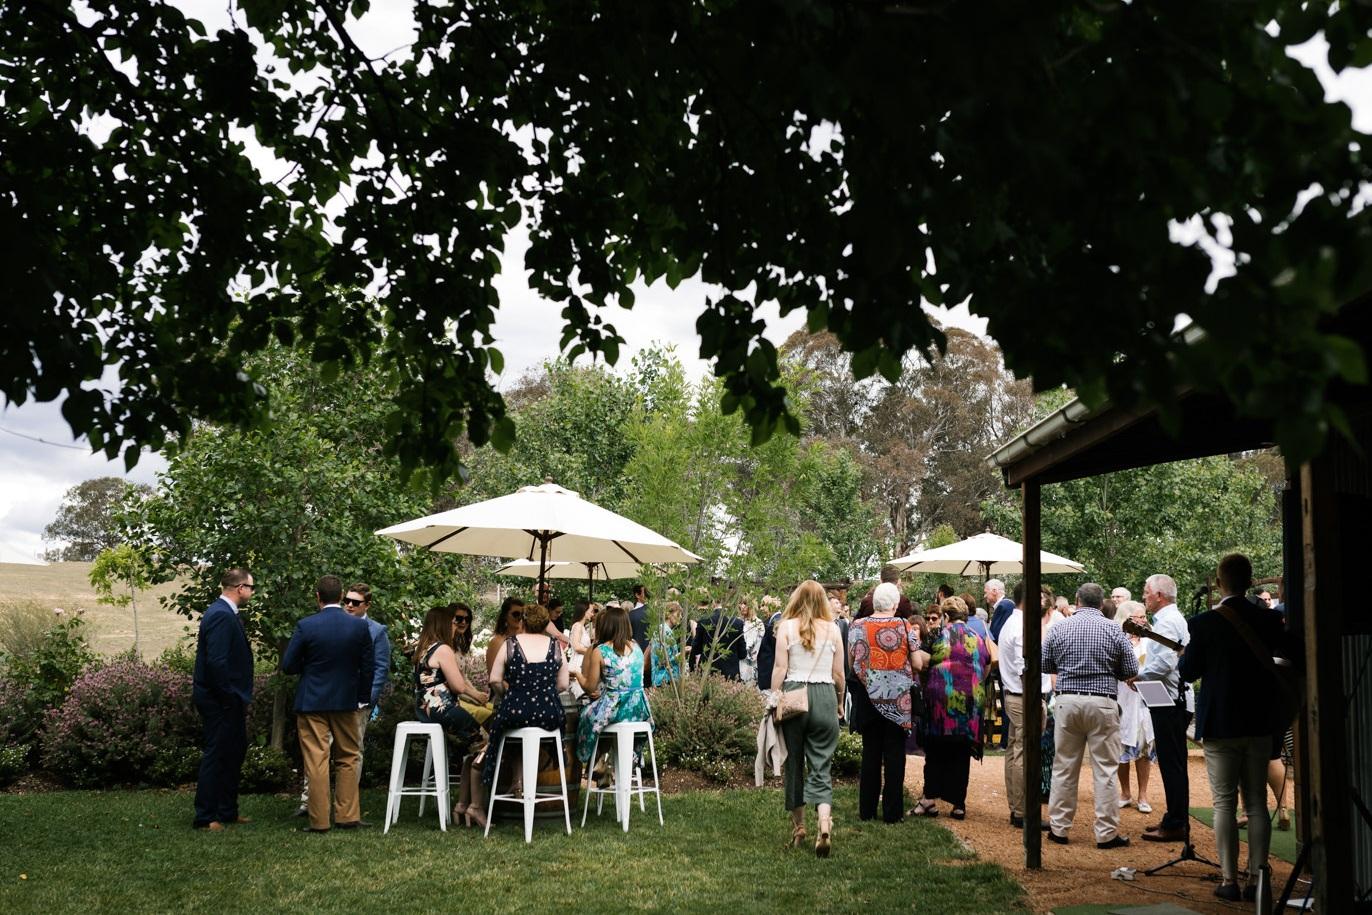 Erin+Latimore+Canberra+Mudgee+Wedding+Photographer+Gundaroo+Gunning+Old+Coach+Stables+%28475+of+865%29.jpg